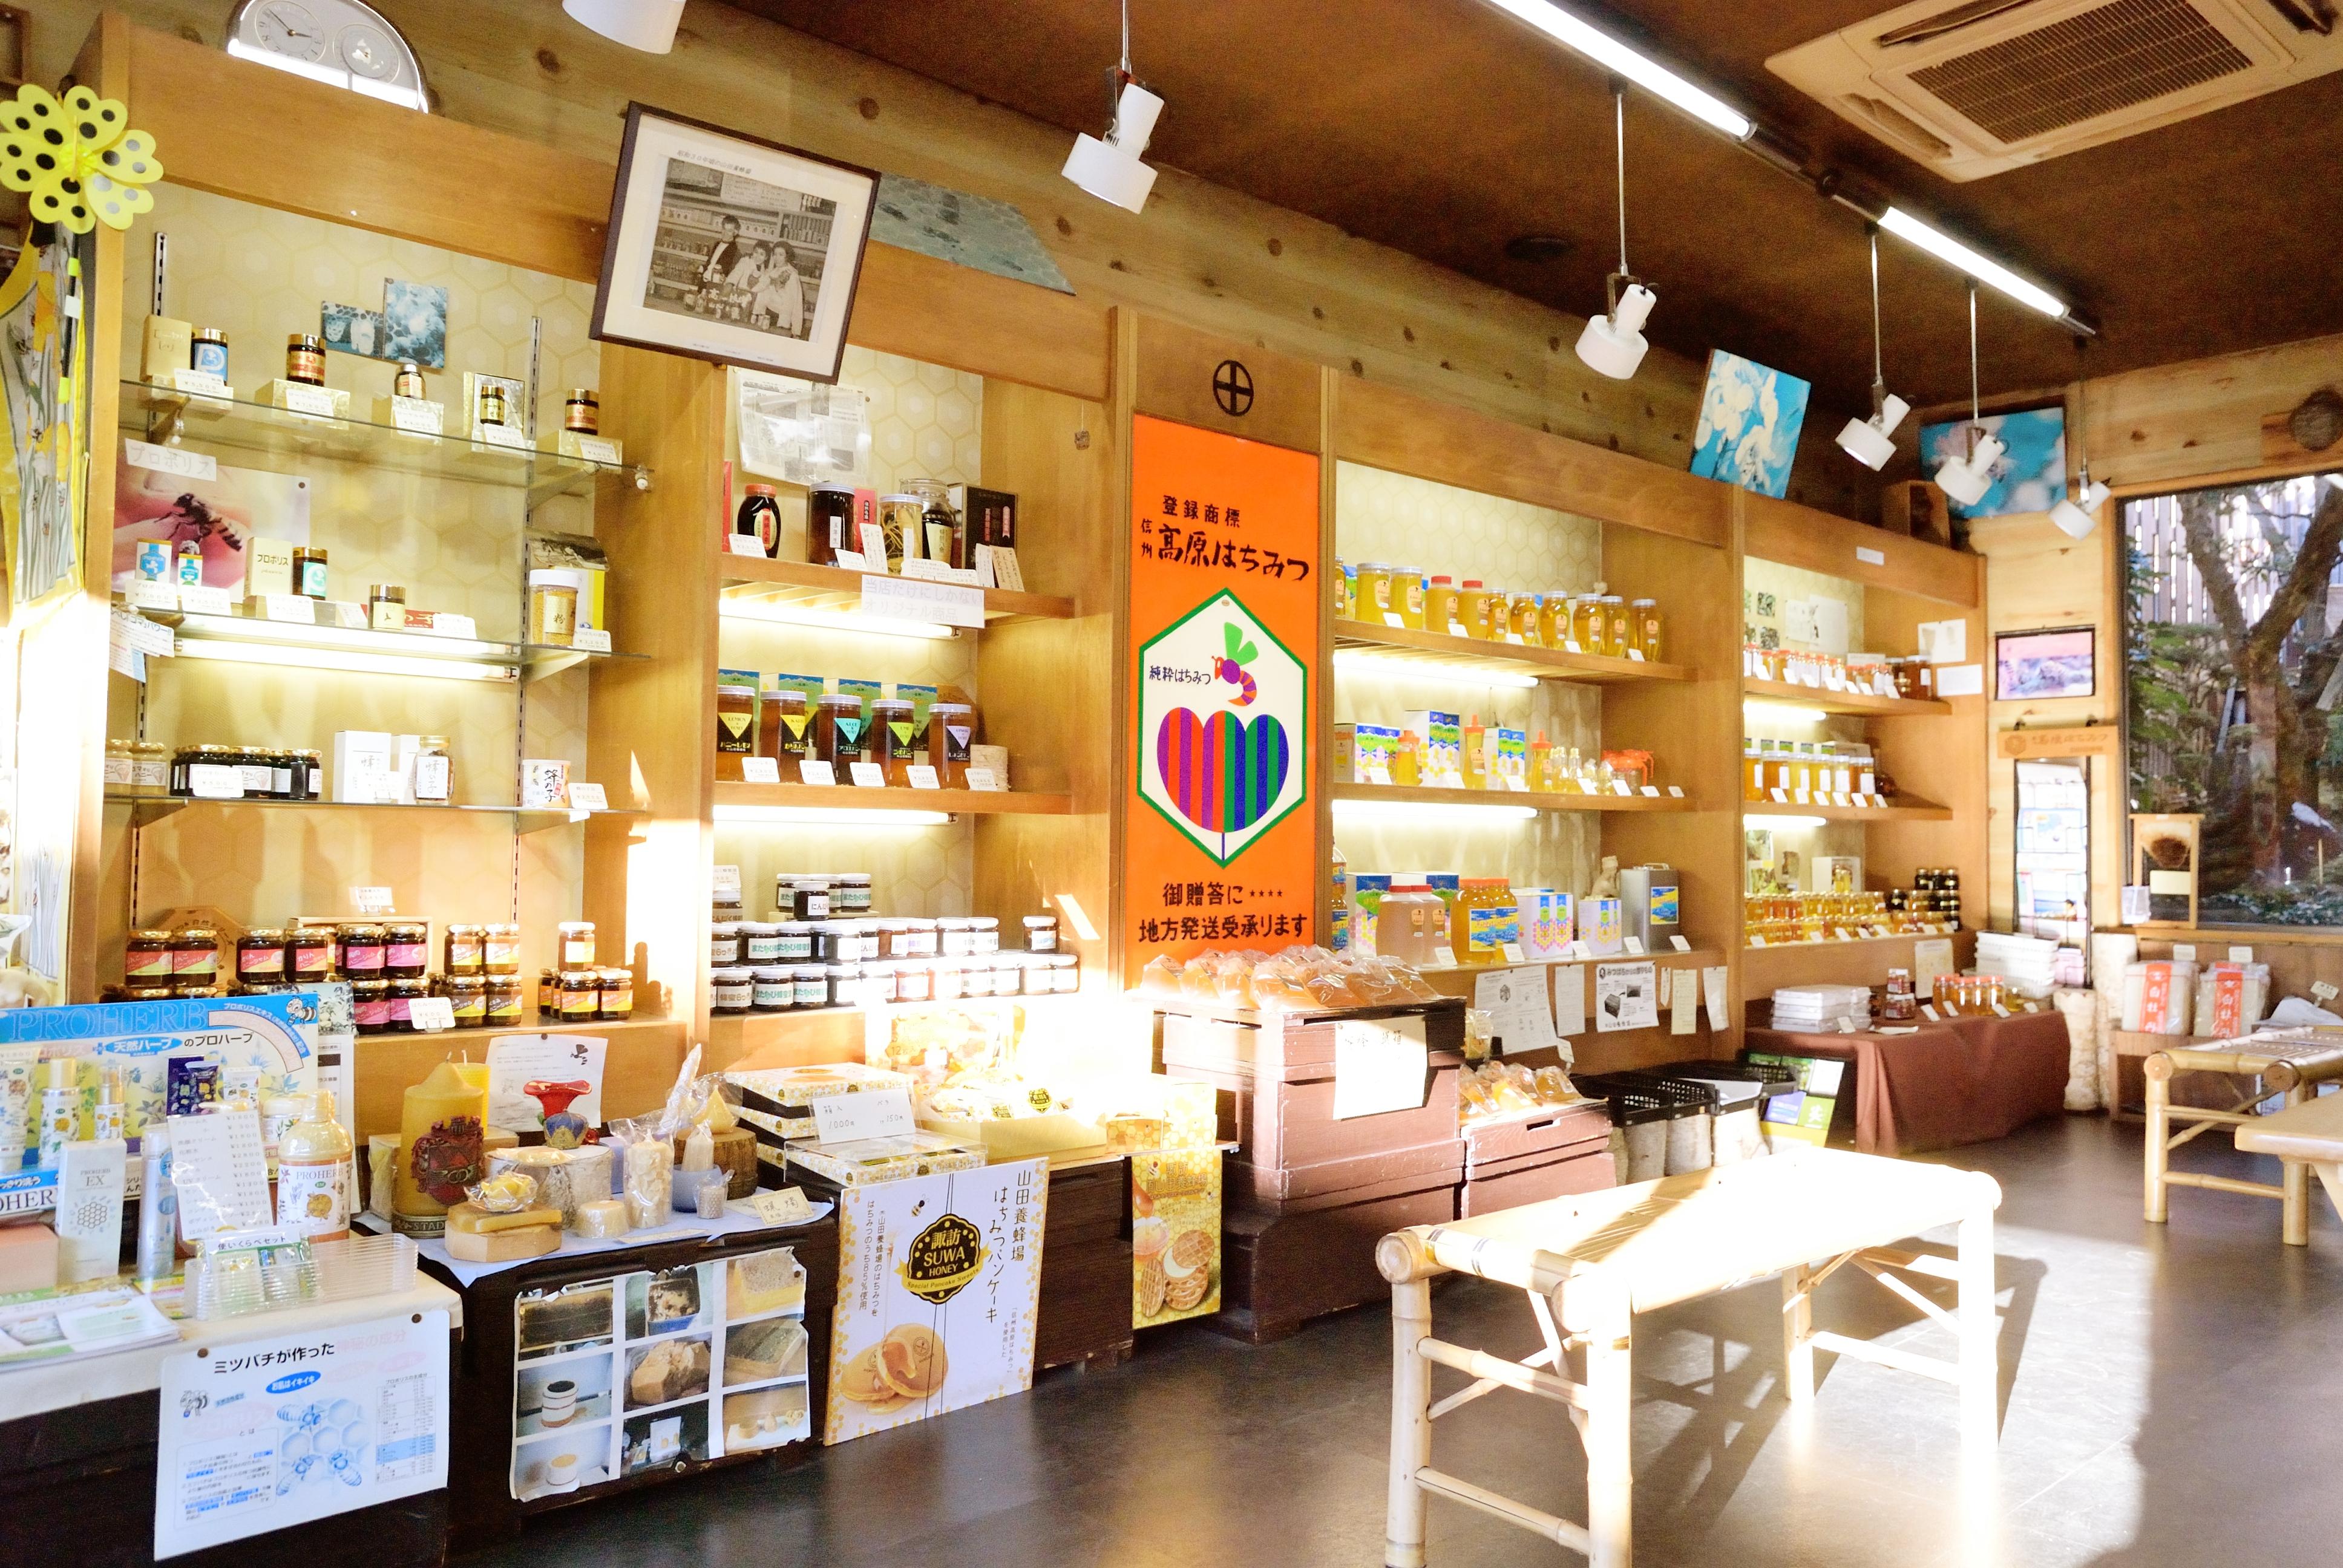 山田 養蜂 場 店舗